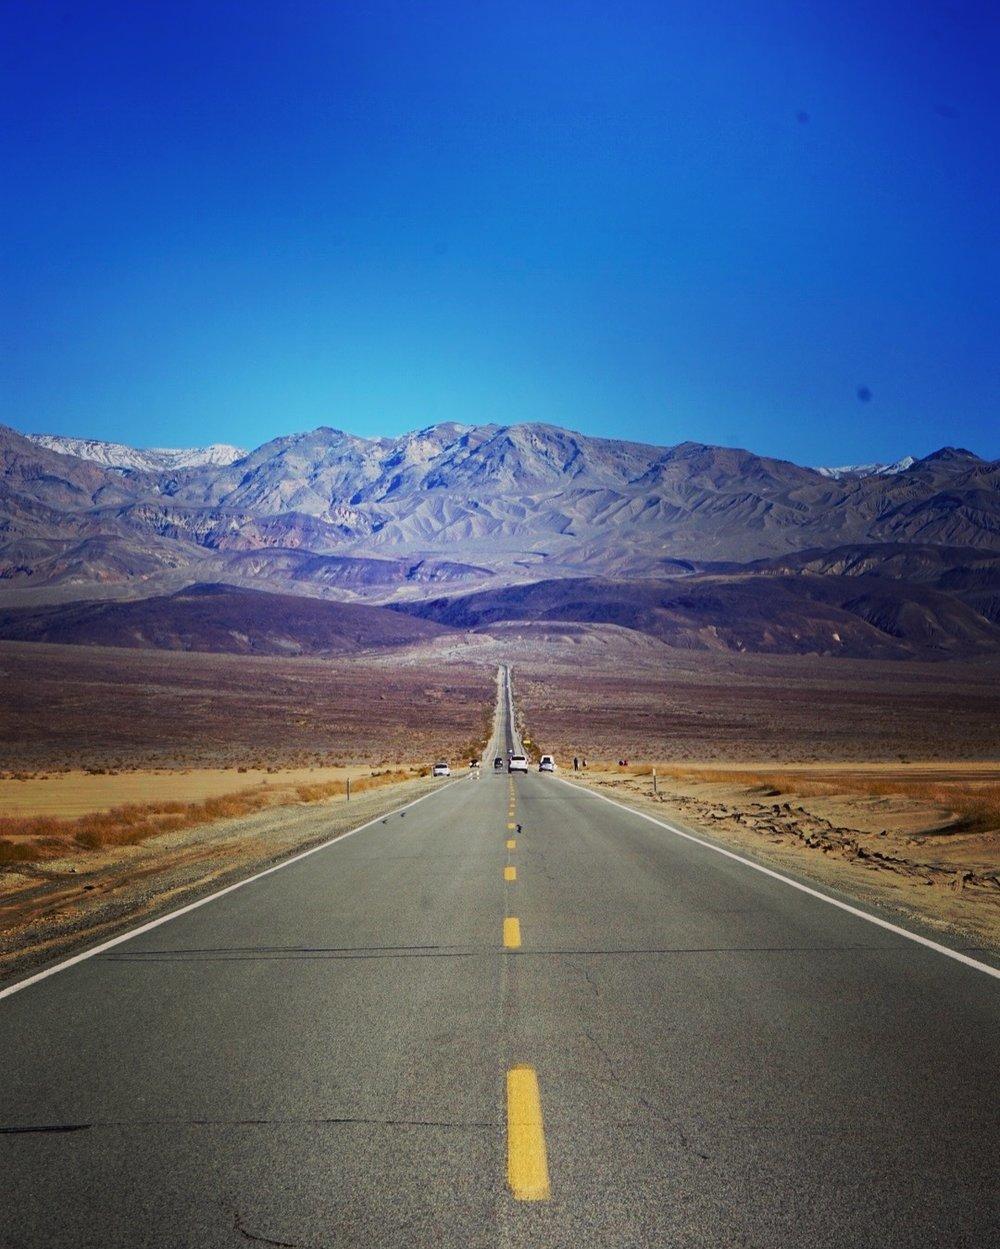 DEATH VALLEY, NEVADA -